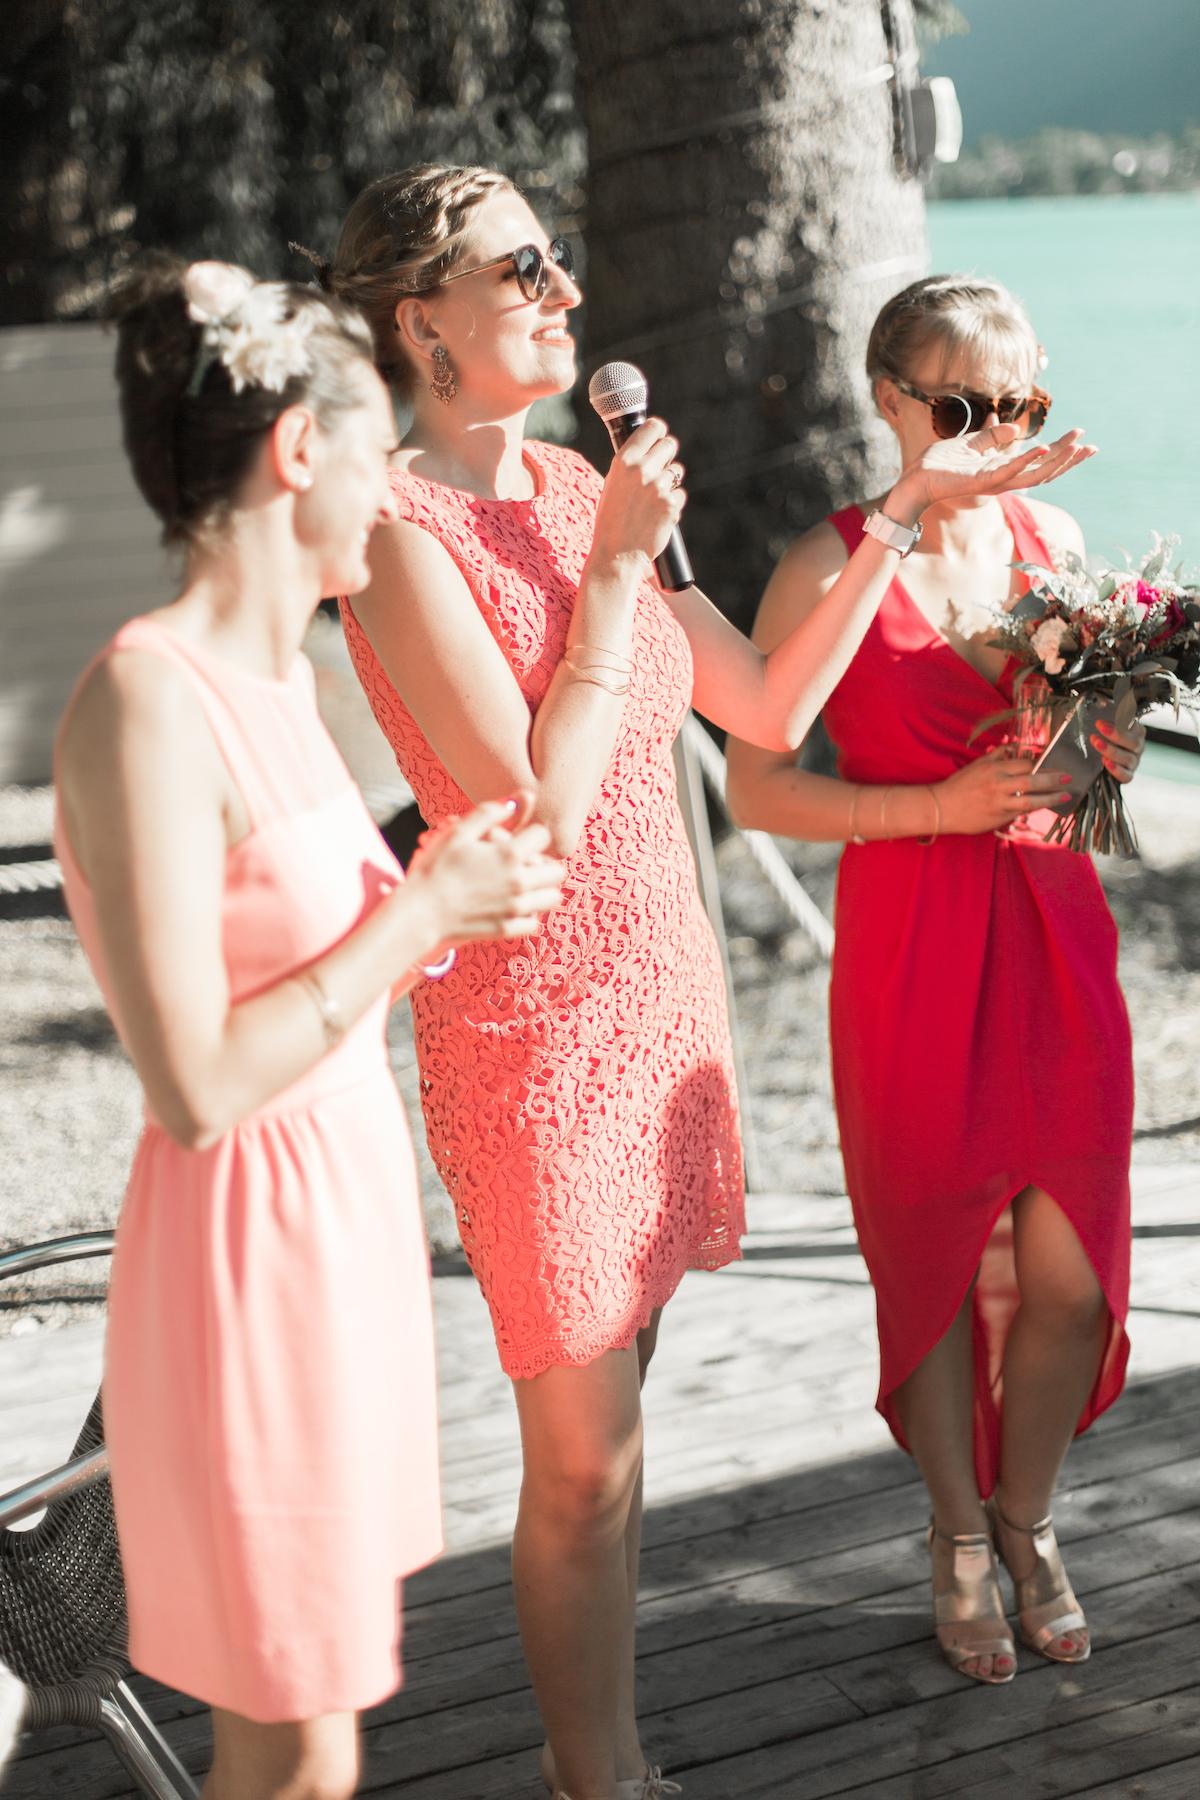 annecy-wedding-photos-186.jpg